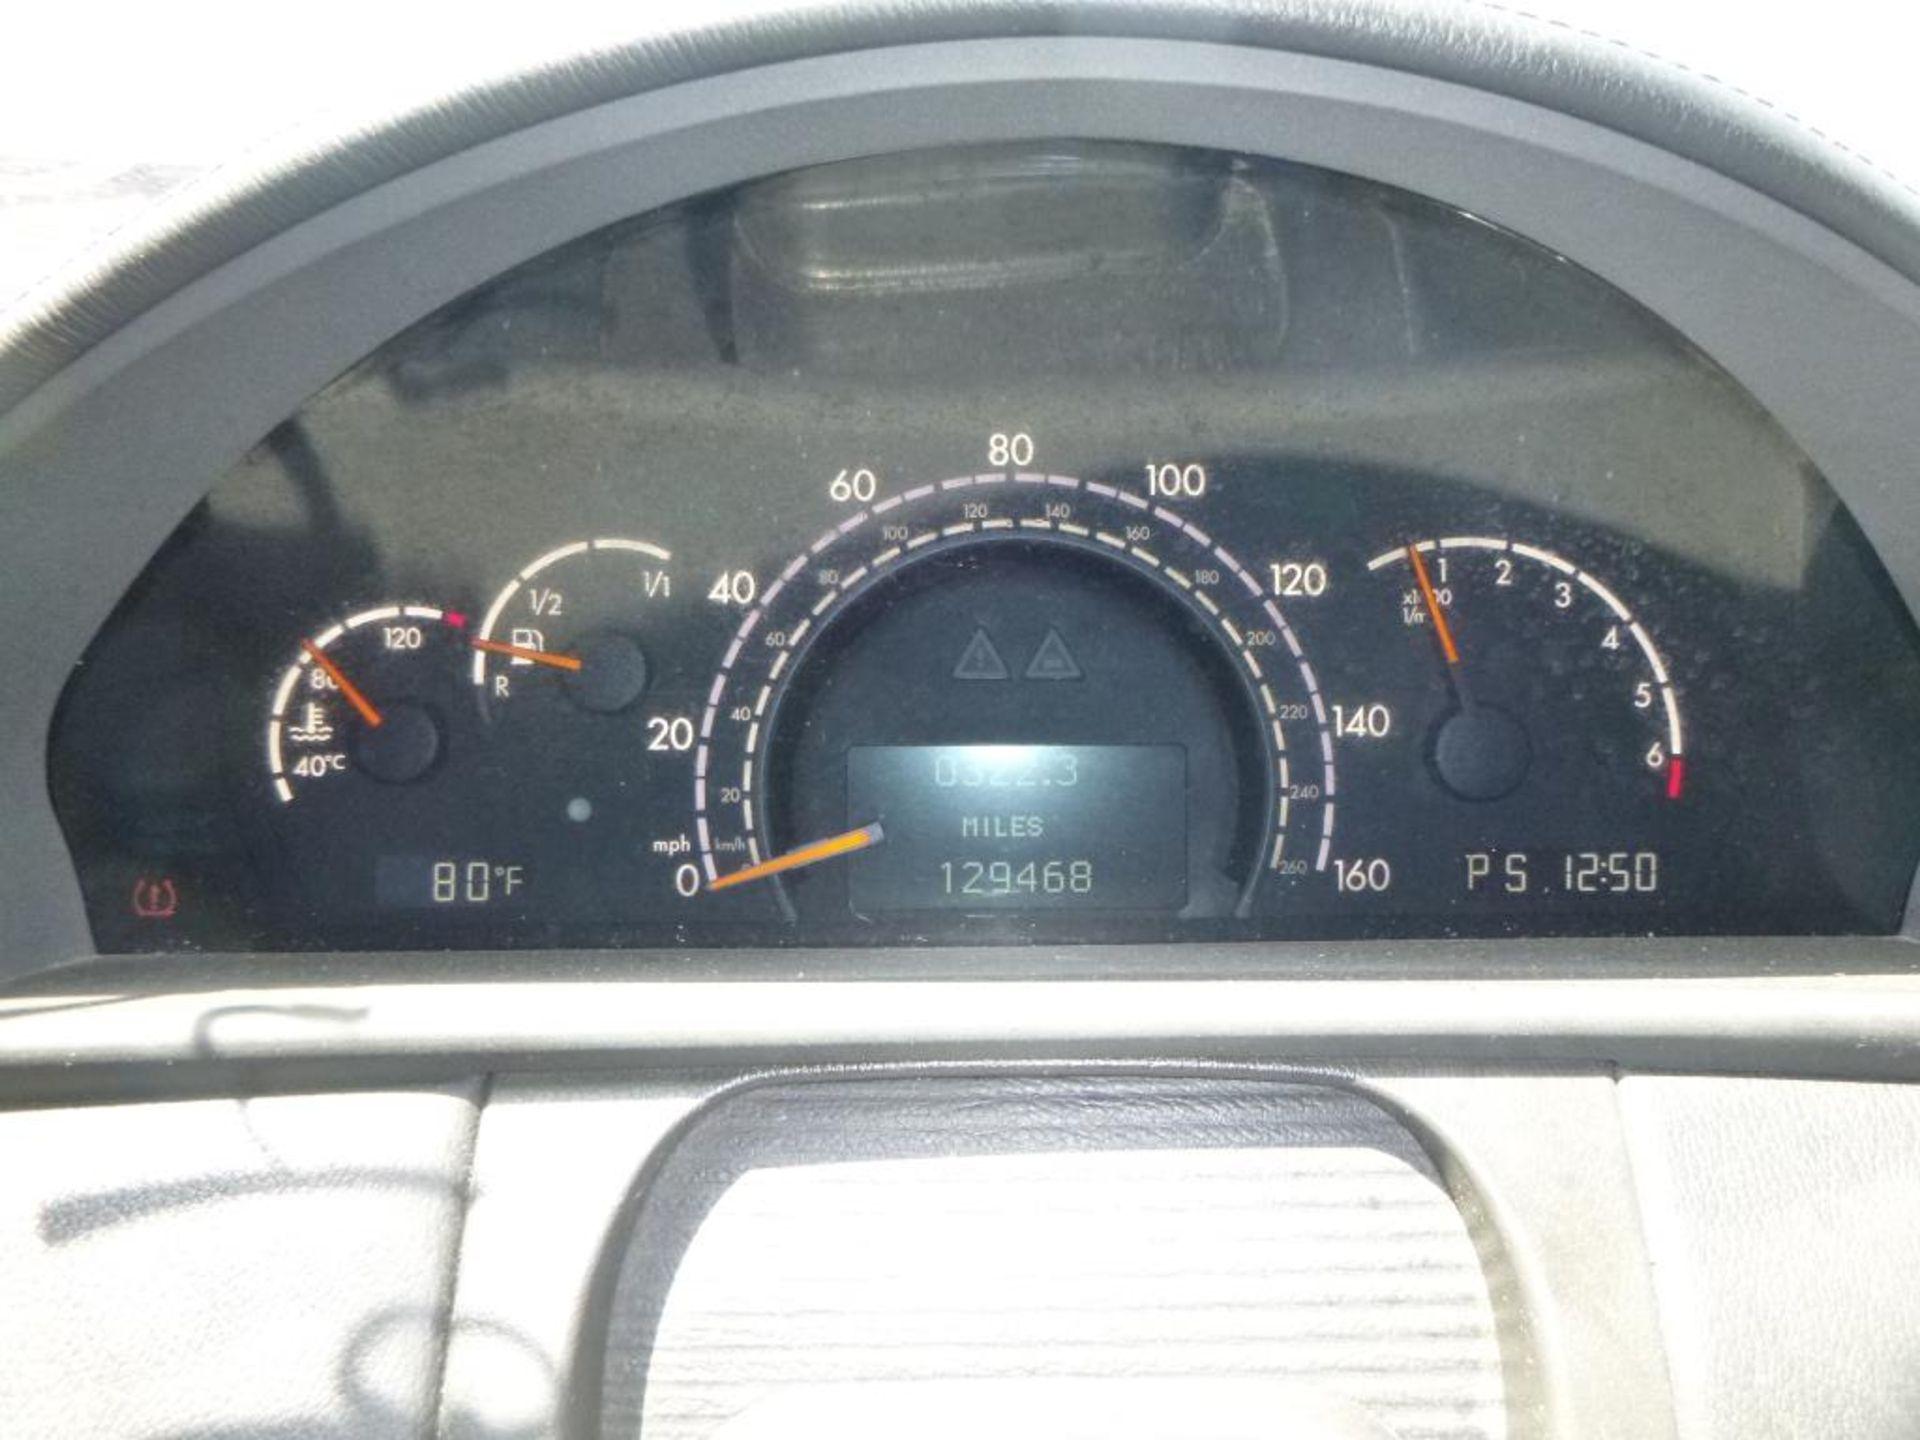 2004 Mercedes-Benz CL-Class - Image 12 of 15